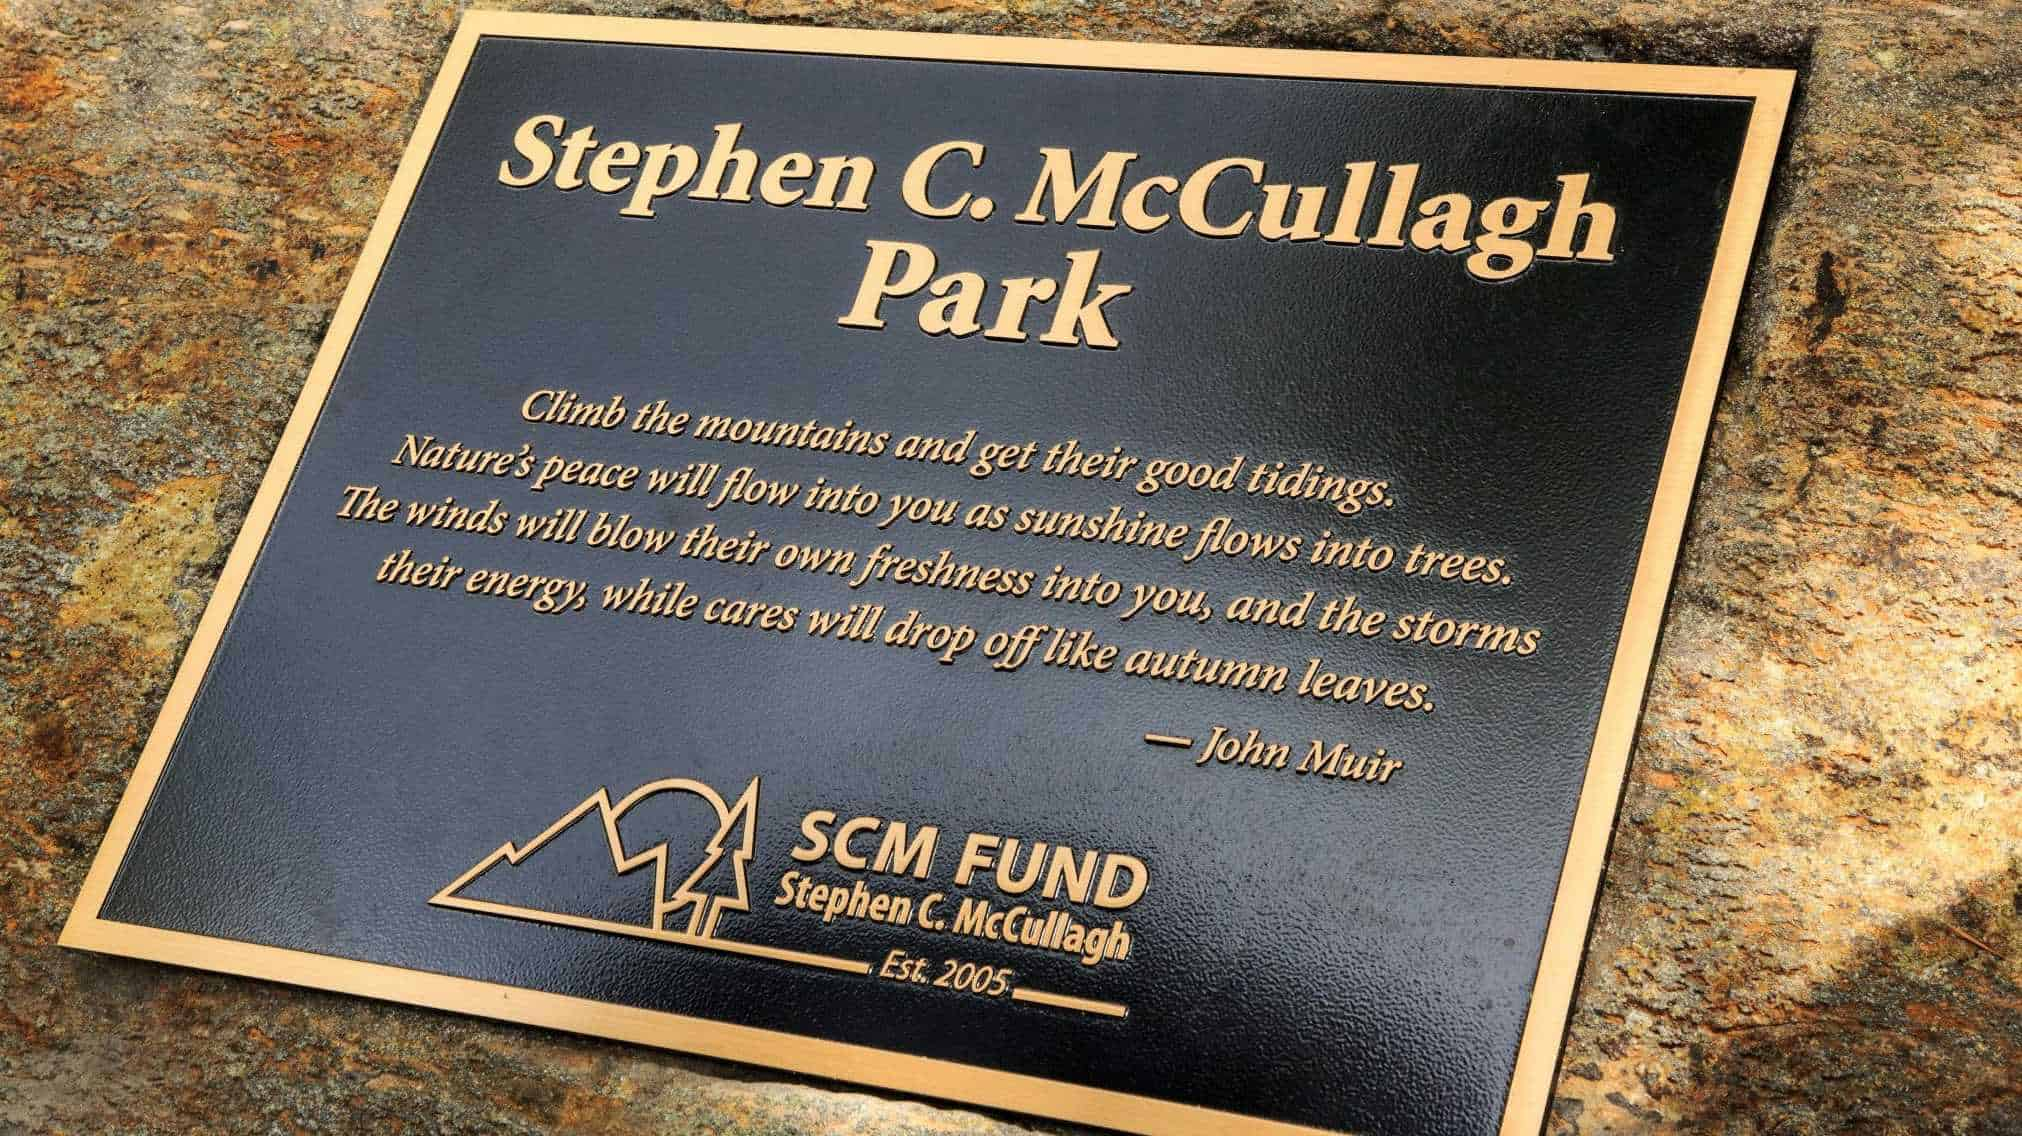 Stephen C. McCullagh Park